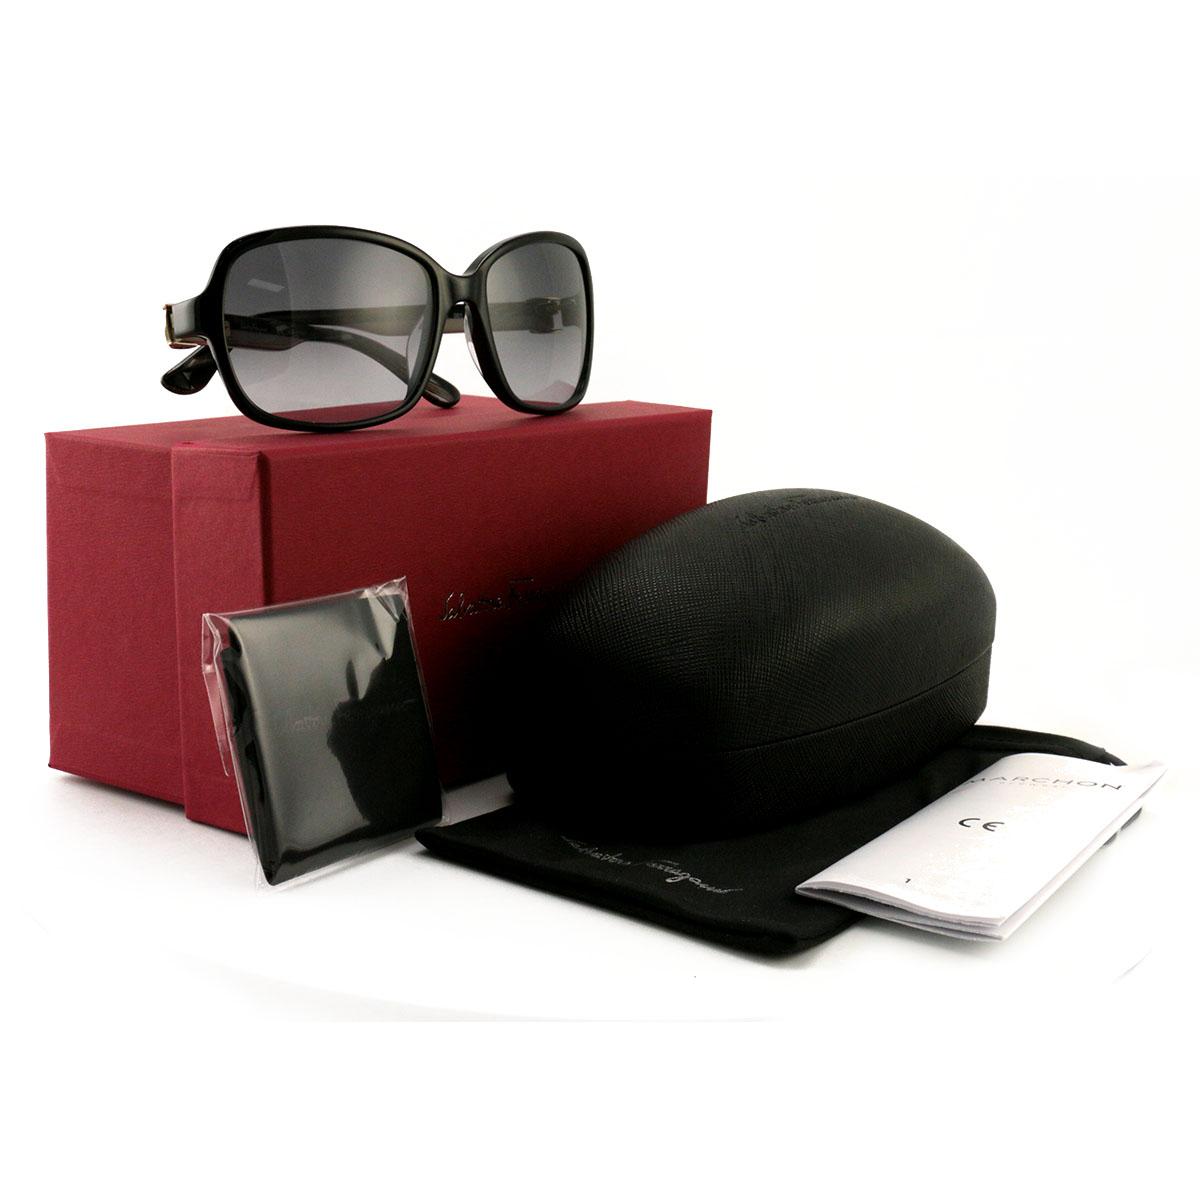 6191f48df7 Details about Salvatore Ferragamo Women´s Sunglasses SF606S 001 Black 58 17  130